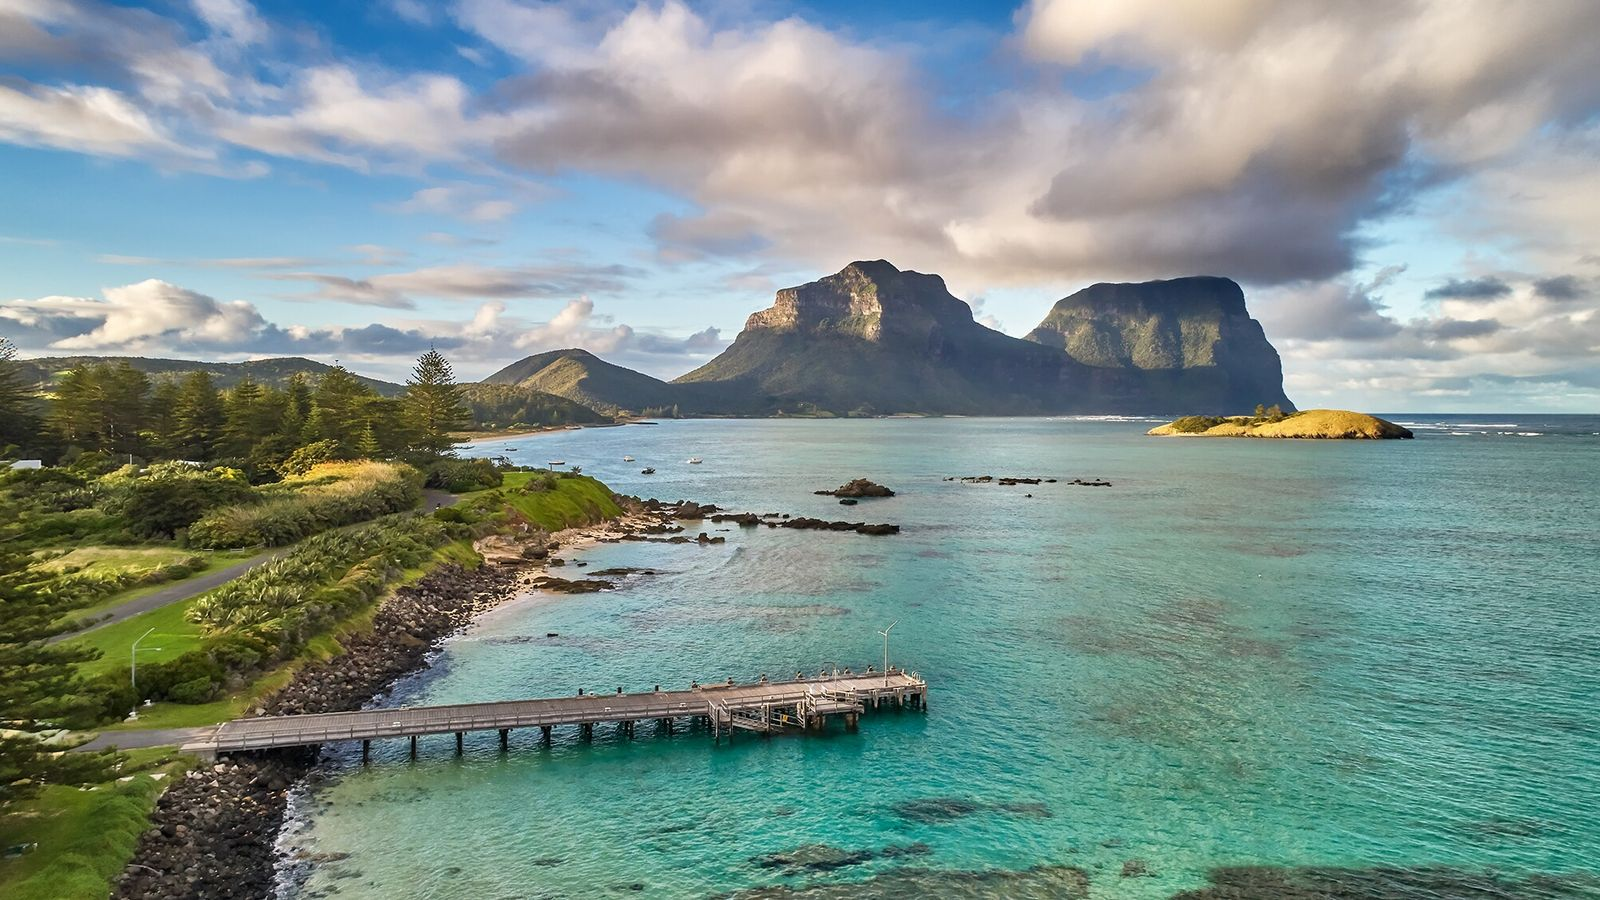 Ilha Lord Howe, Austrália | O Monte Lidgbird se ergue sobre a lagoa na Ilha Lord ...